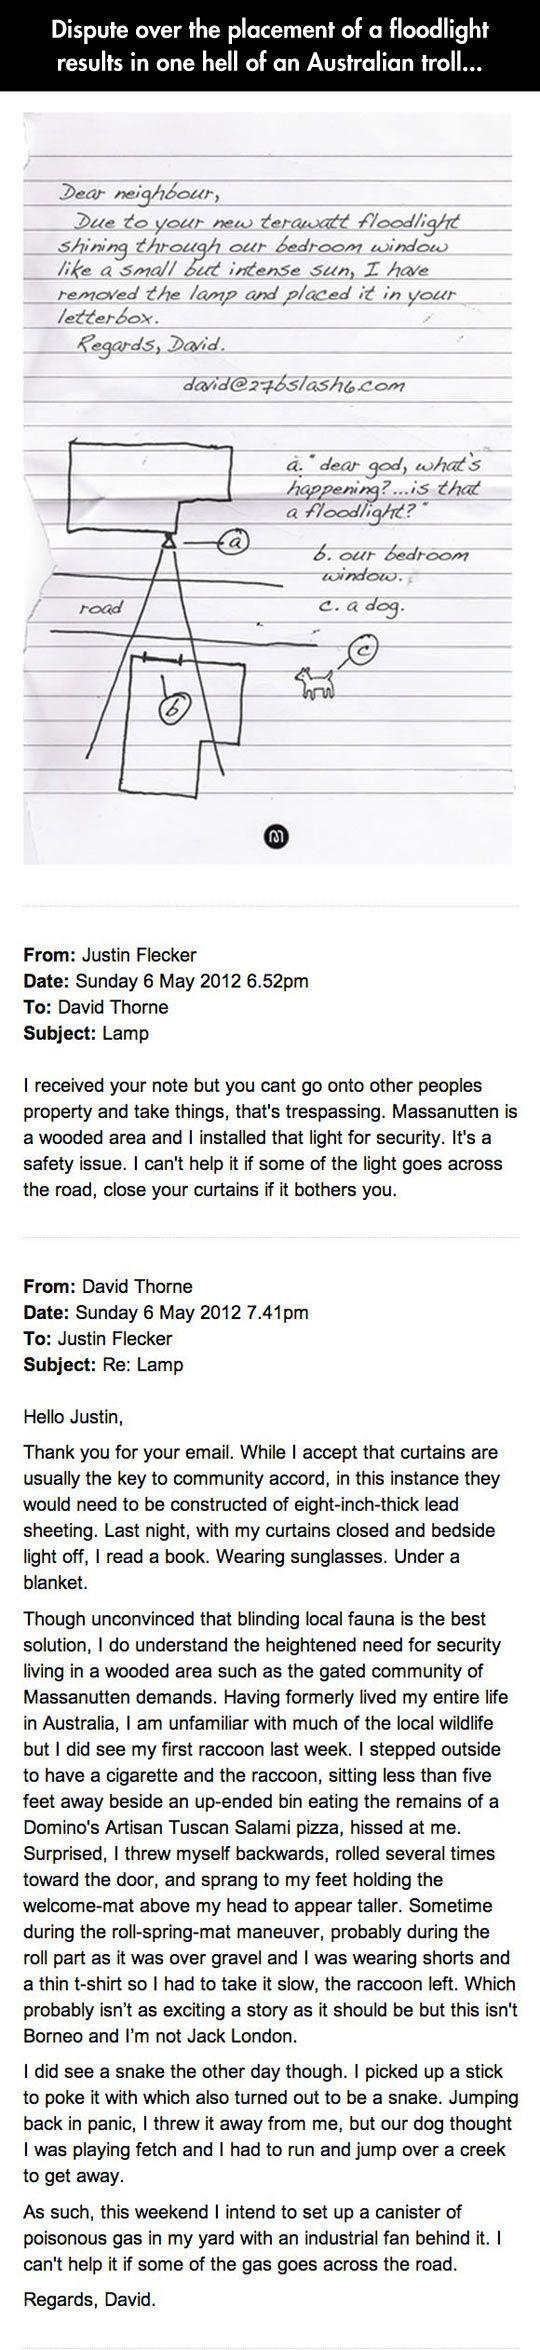 Part 1 funny-Australian-troll-floodlight-email-neighbour